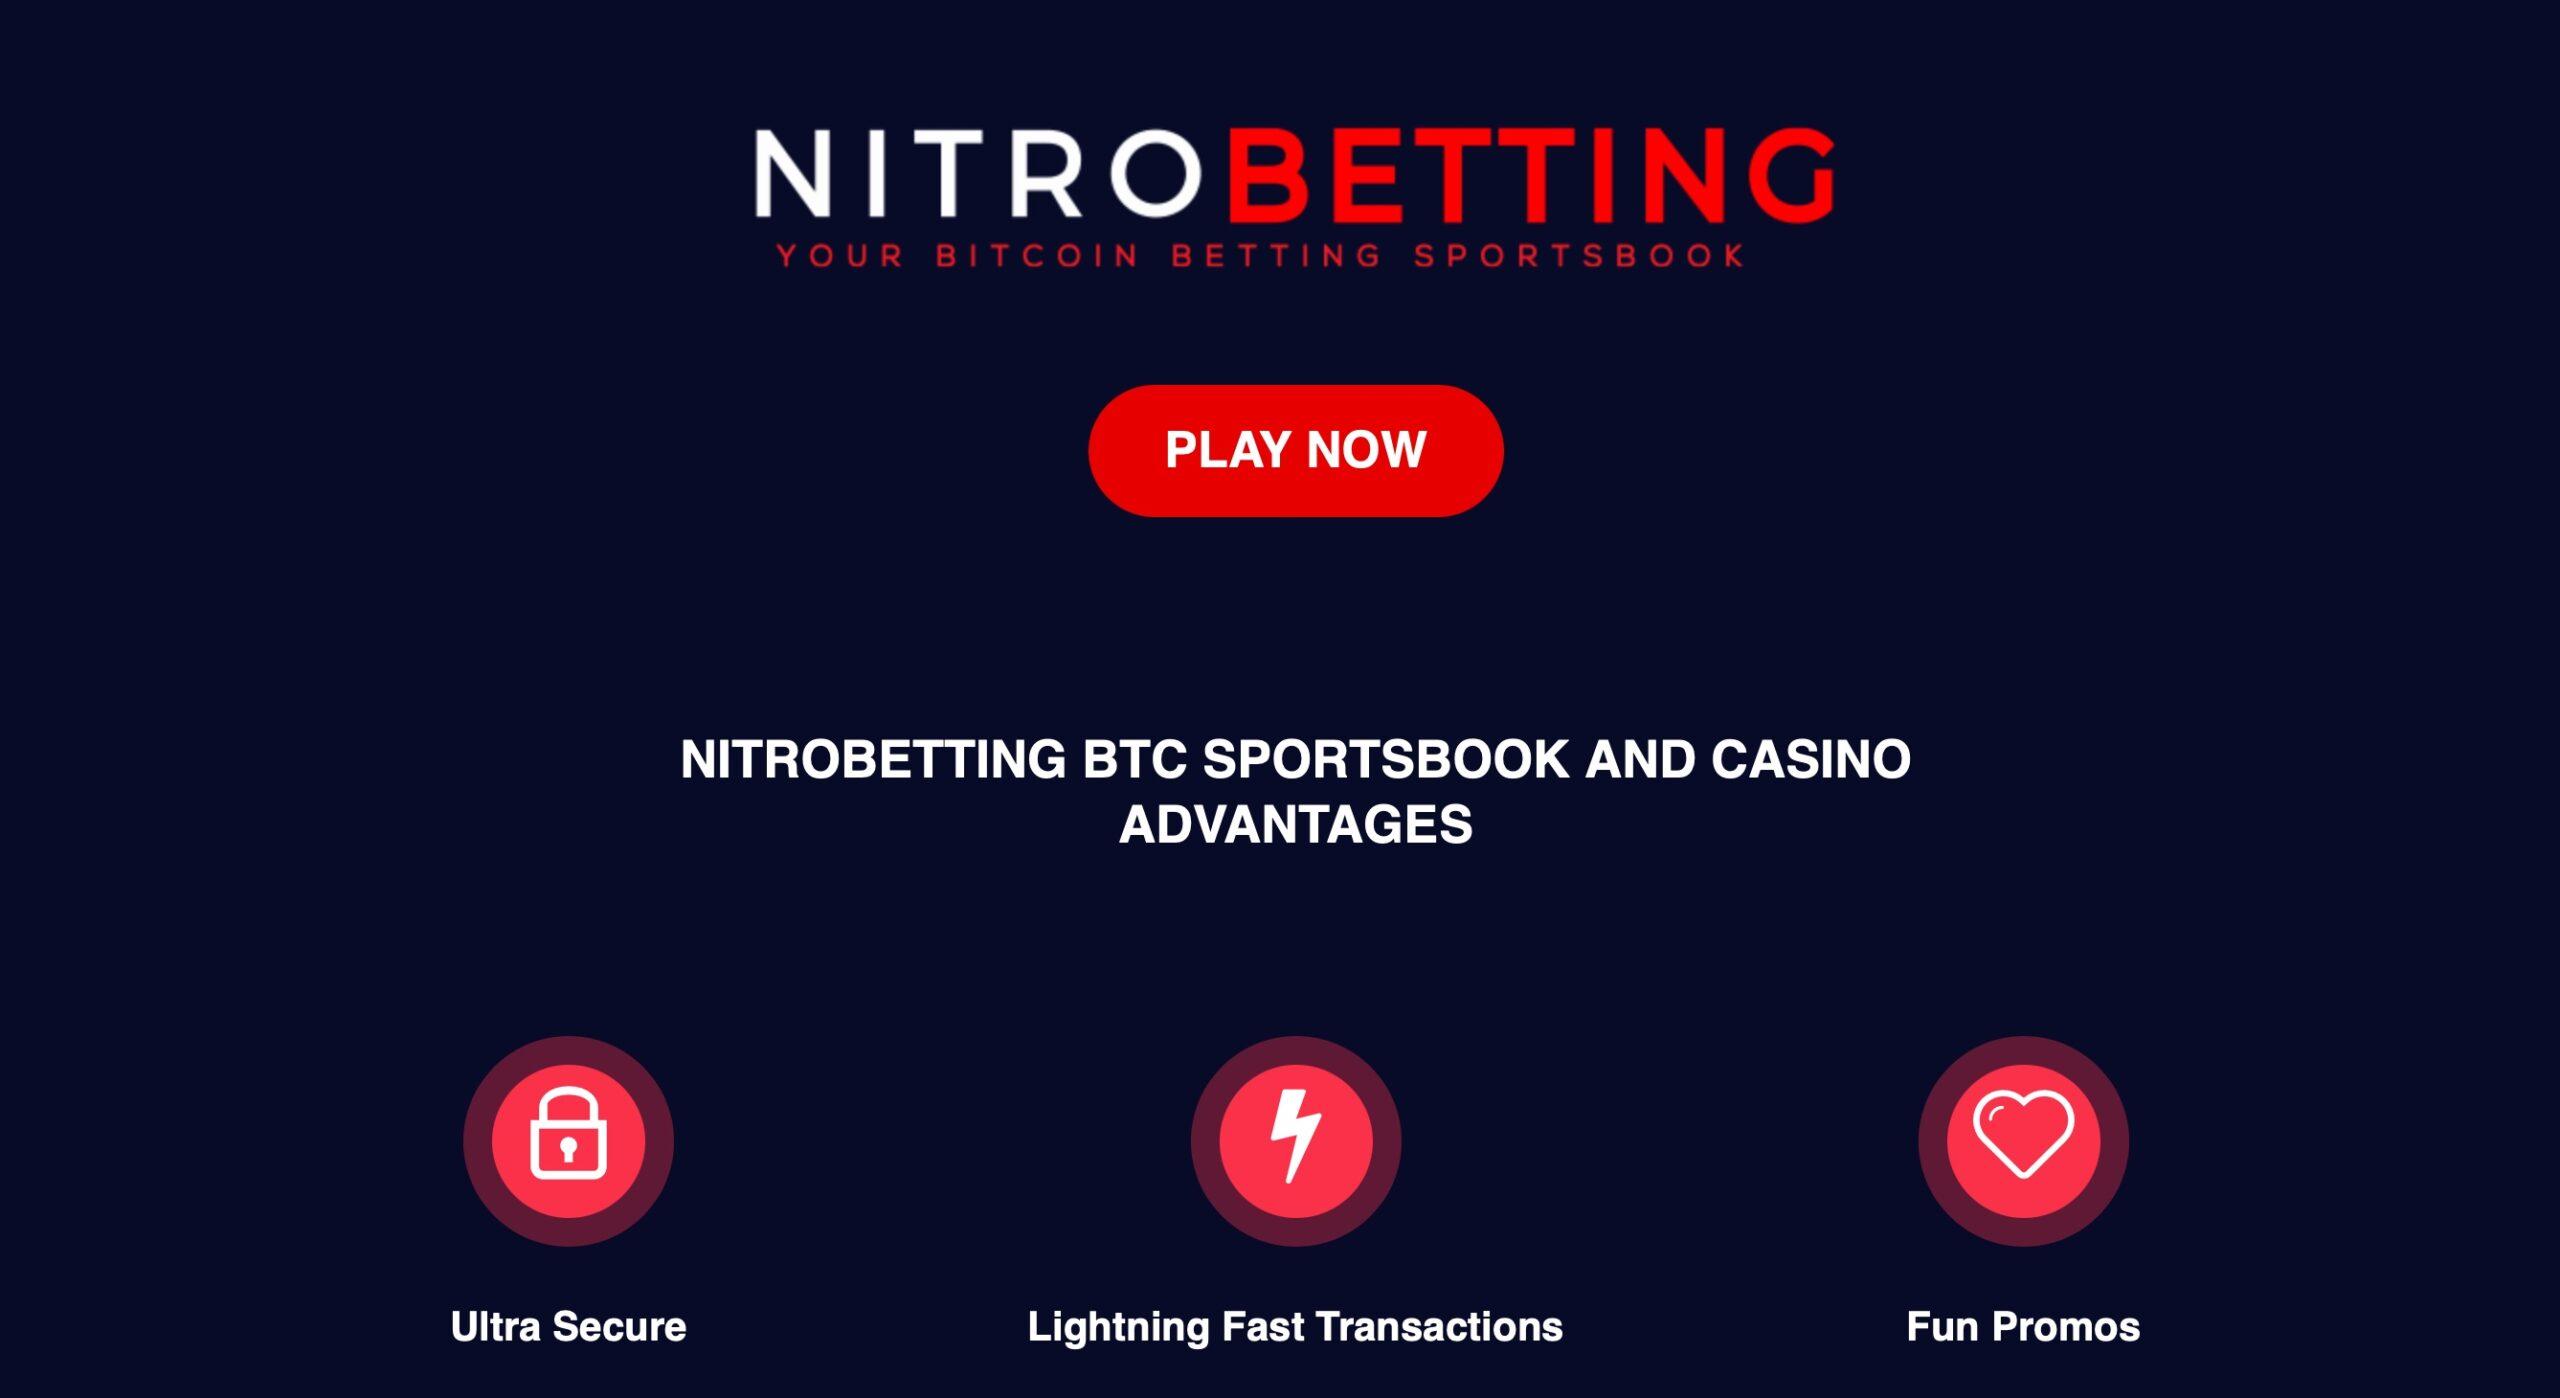 About Nitrobetting site & NitrobettingReview